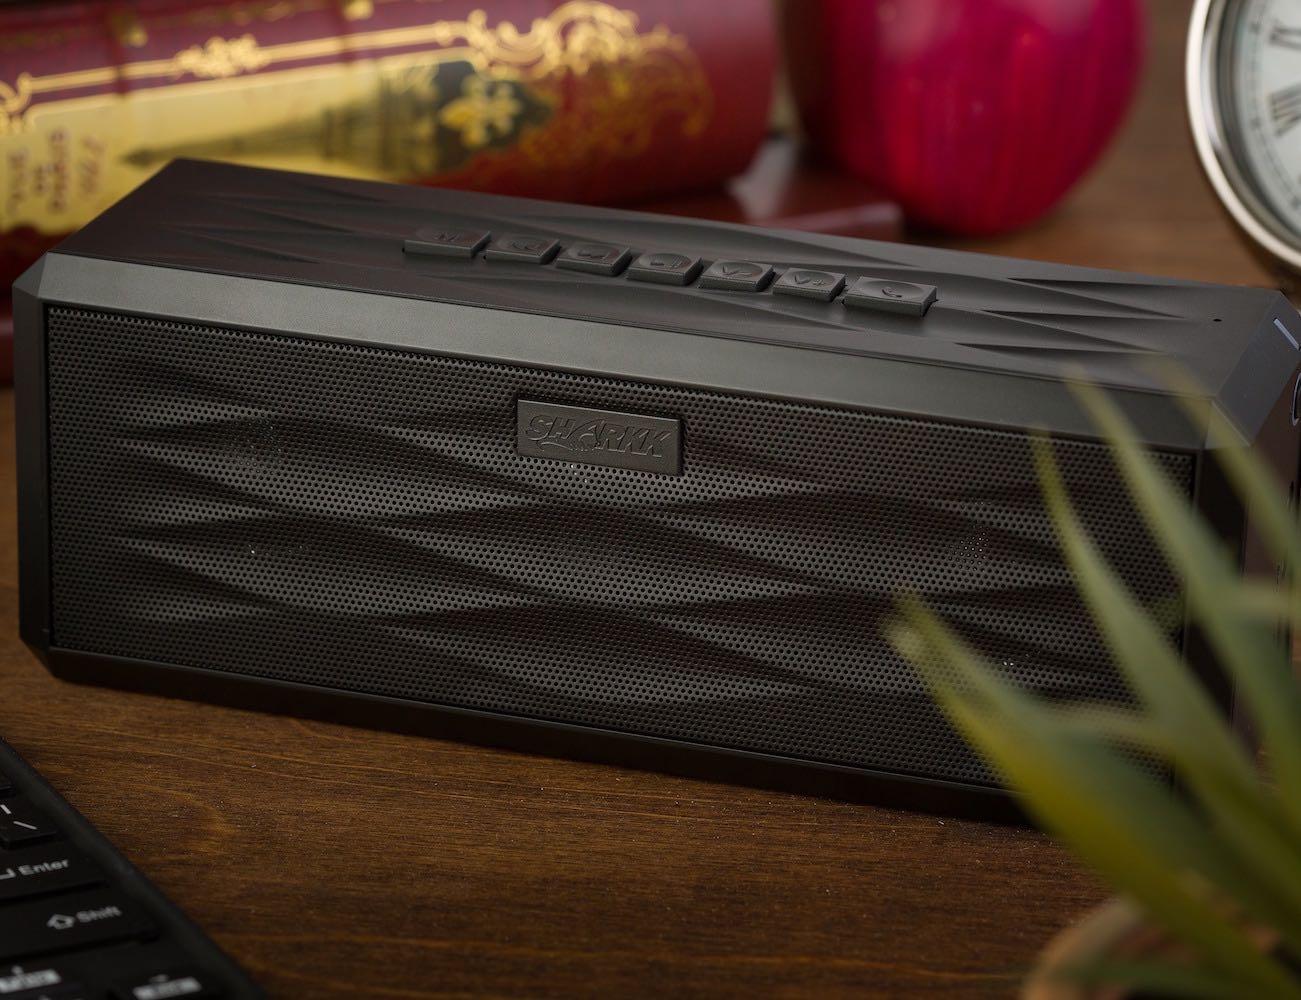 sharkk-boombox-portable-bluetooth-speaker-02